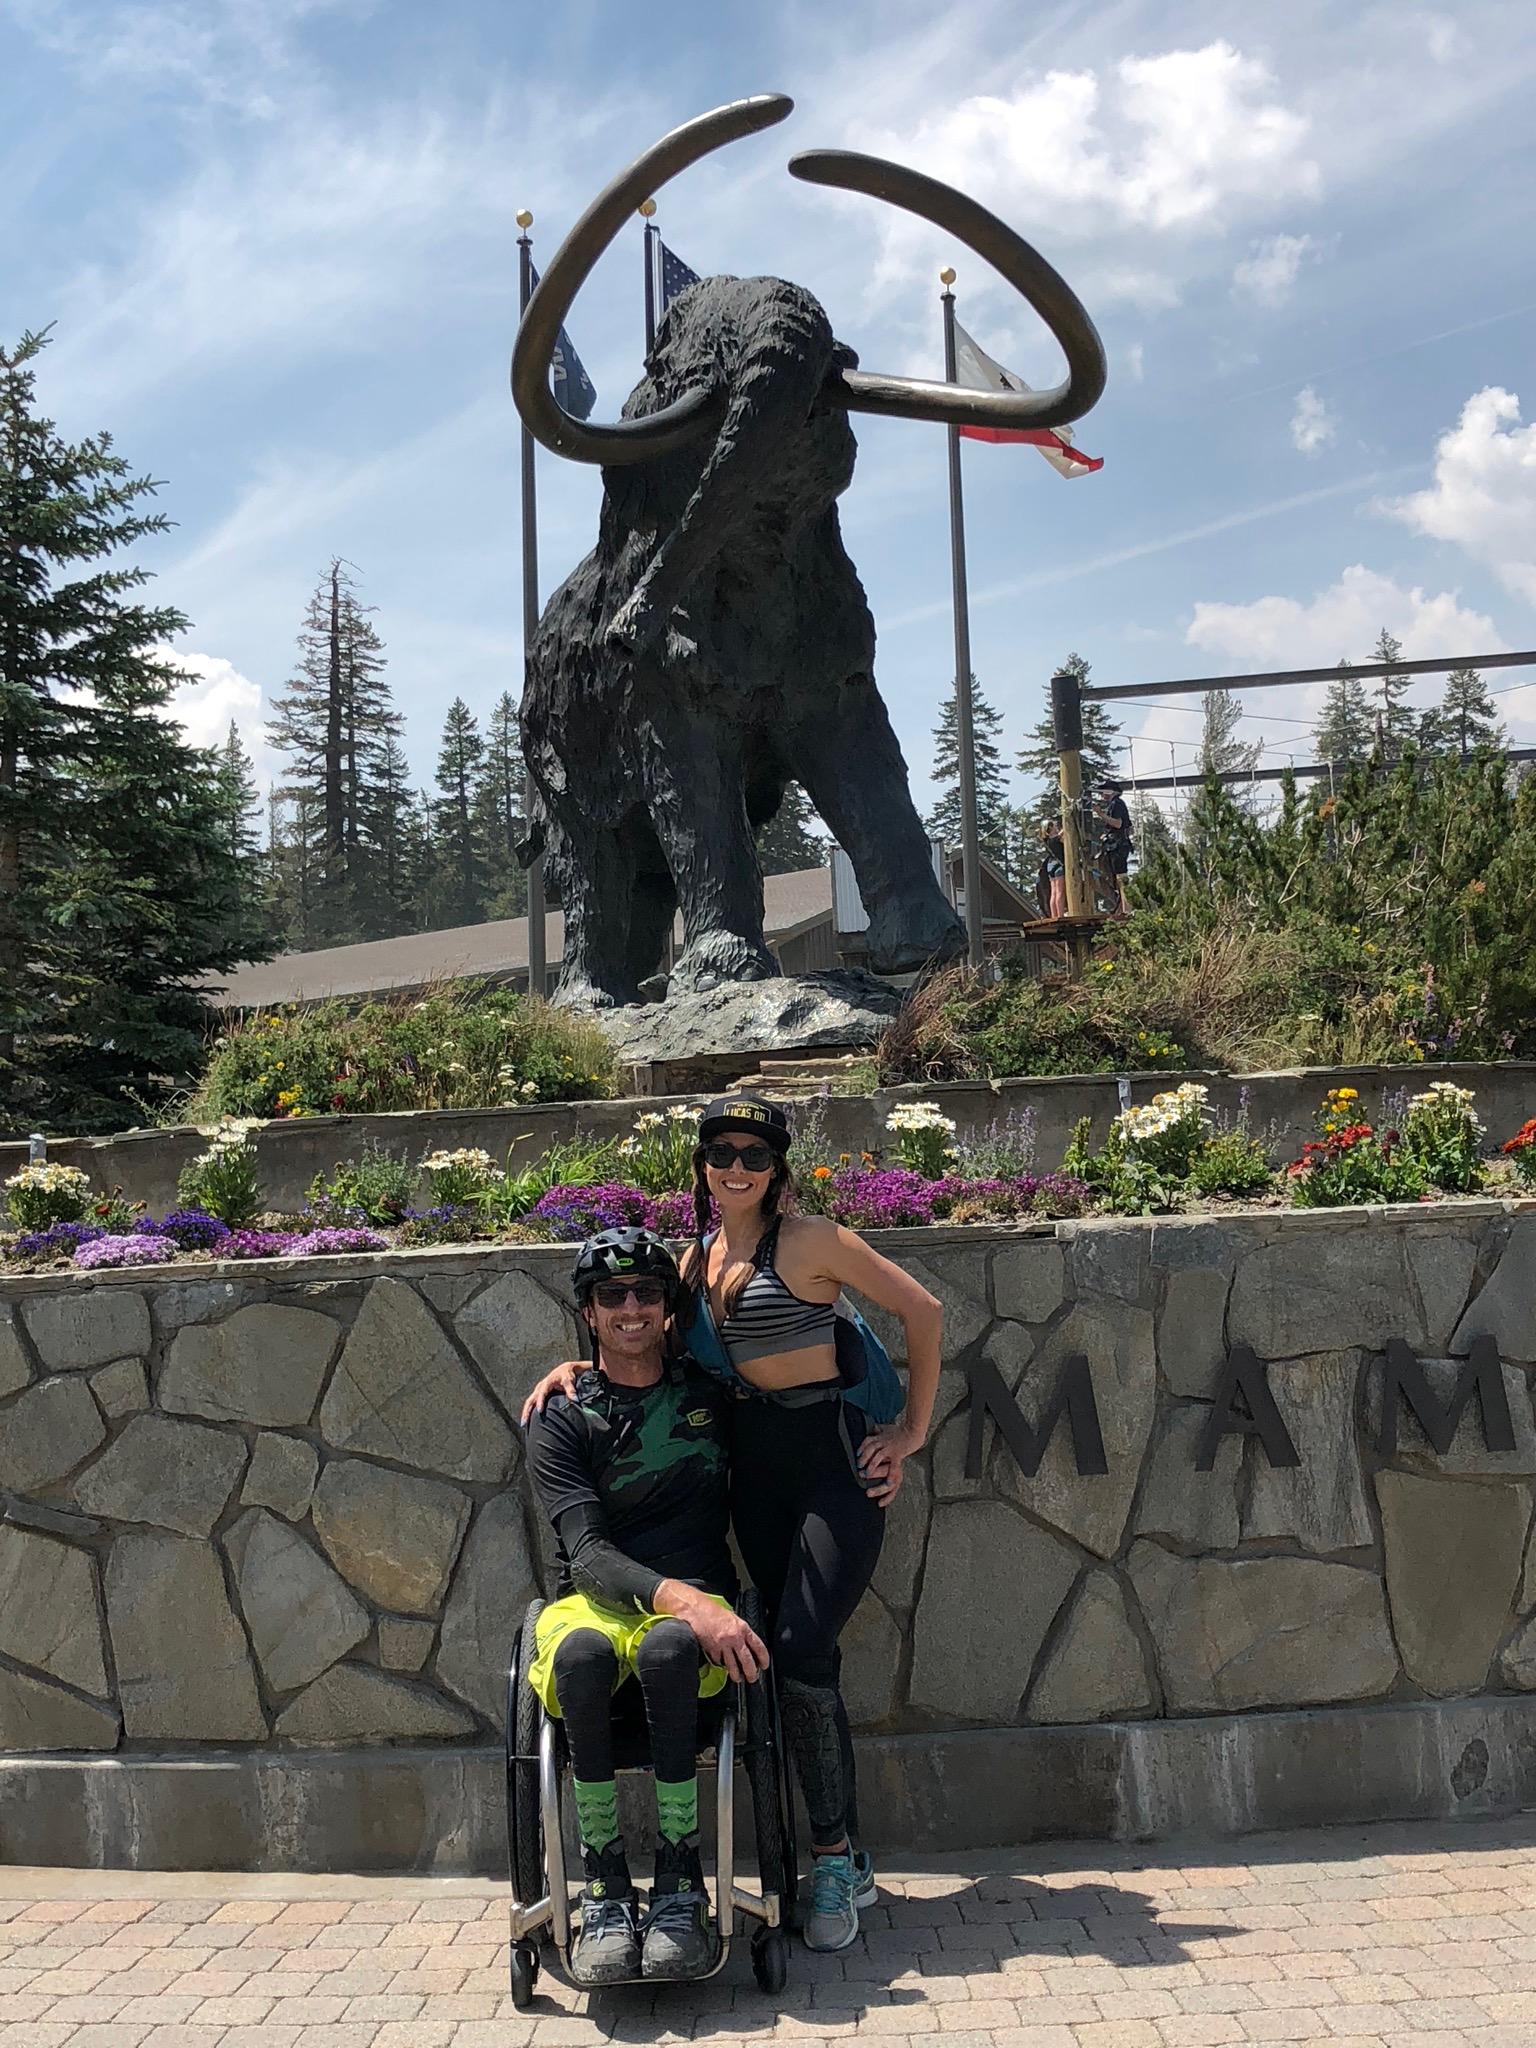 Mandatory photo op at the mammoth statue